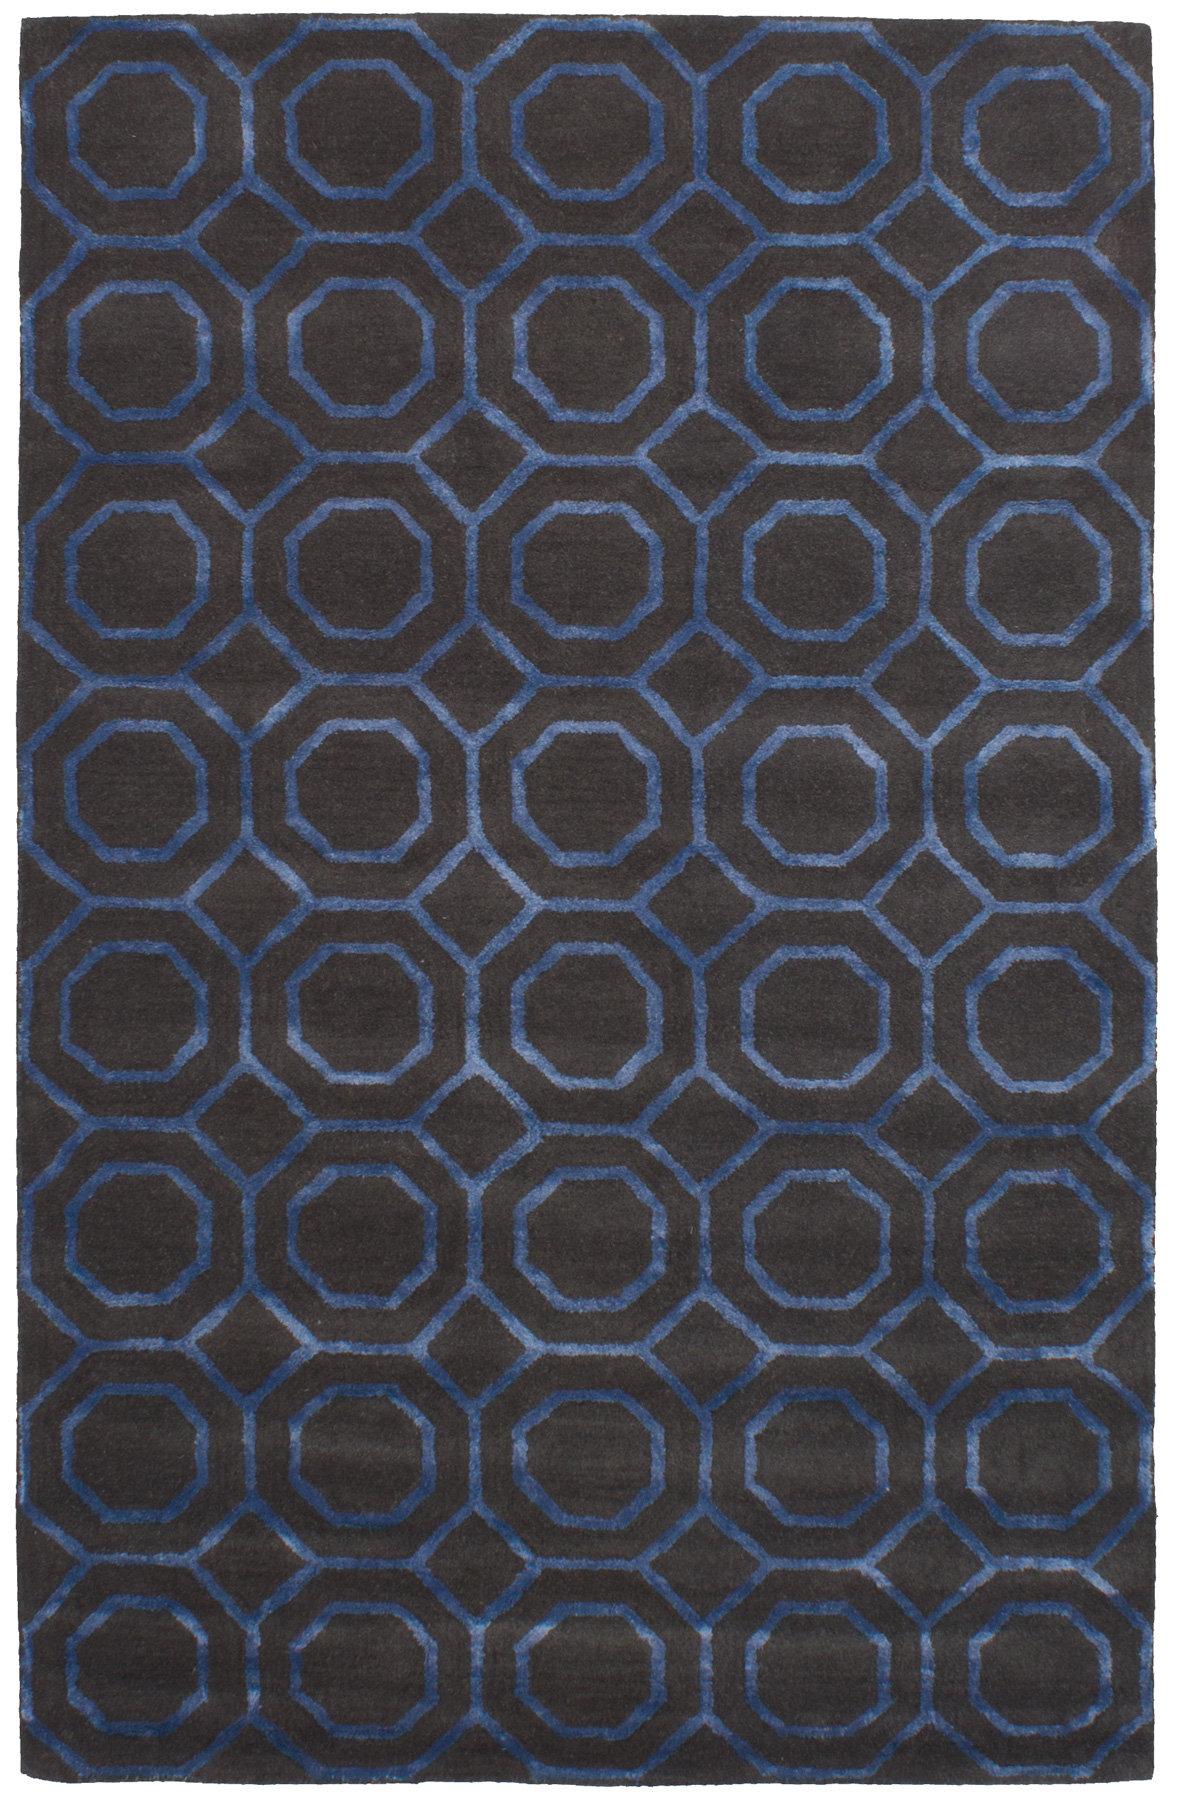 Ivy Bronx Griffing Hand Tufted Wool Silk Dark Gray Blue Area Rug Wayfair